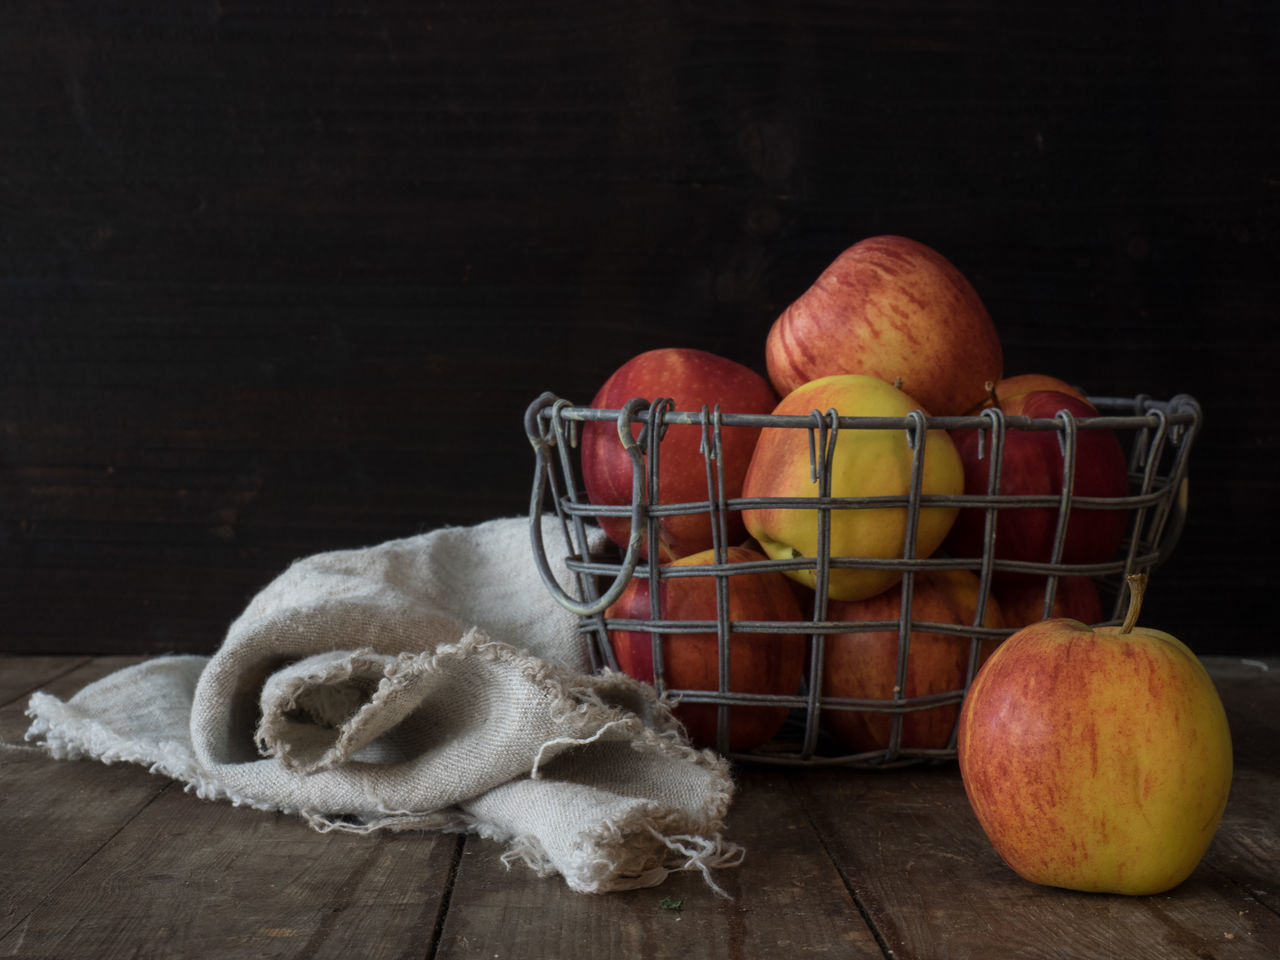 Apples Basket Cloth Dark Background Food Freshness Fruit Healthy Eating Moody Studio Shot Table Wood - Material